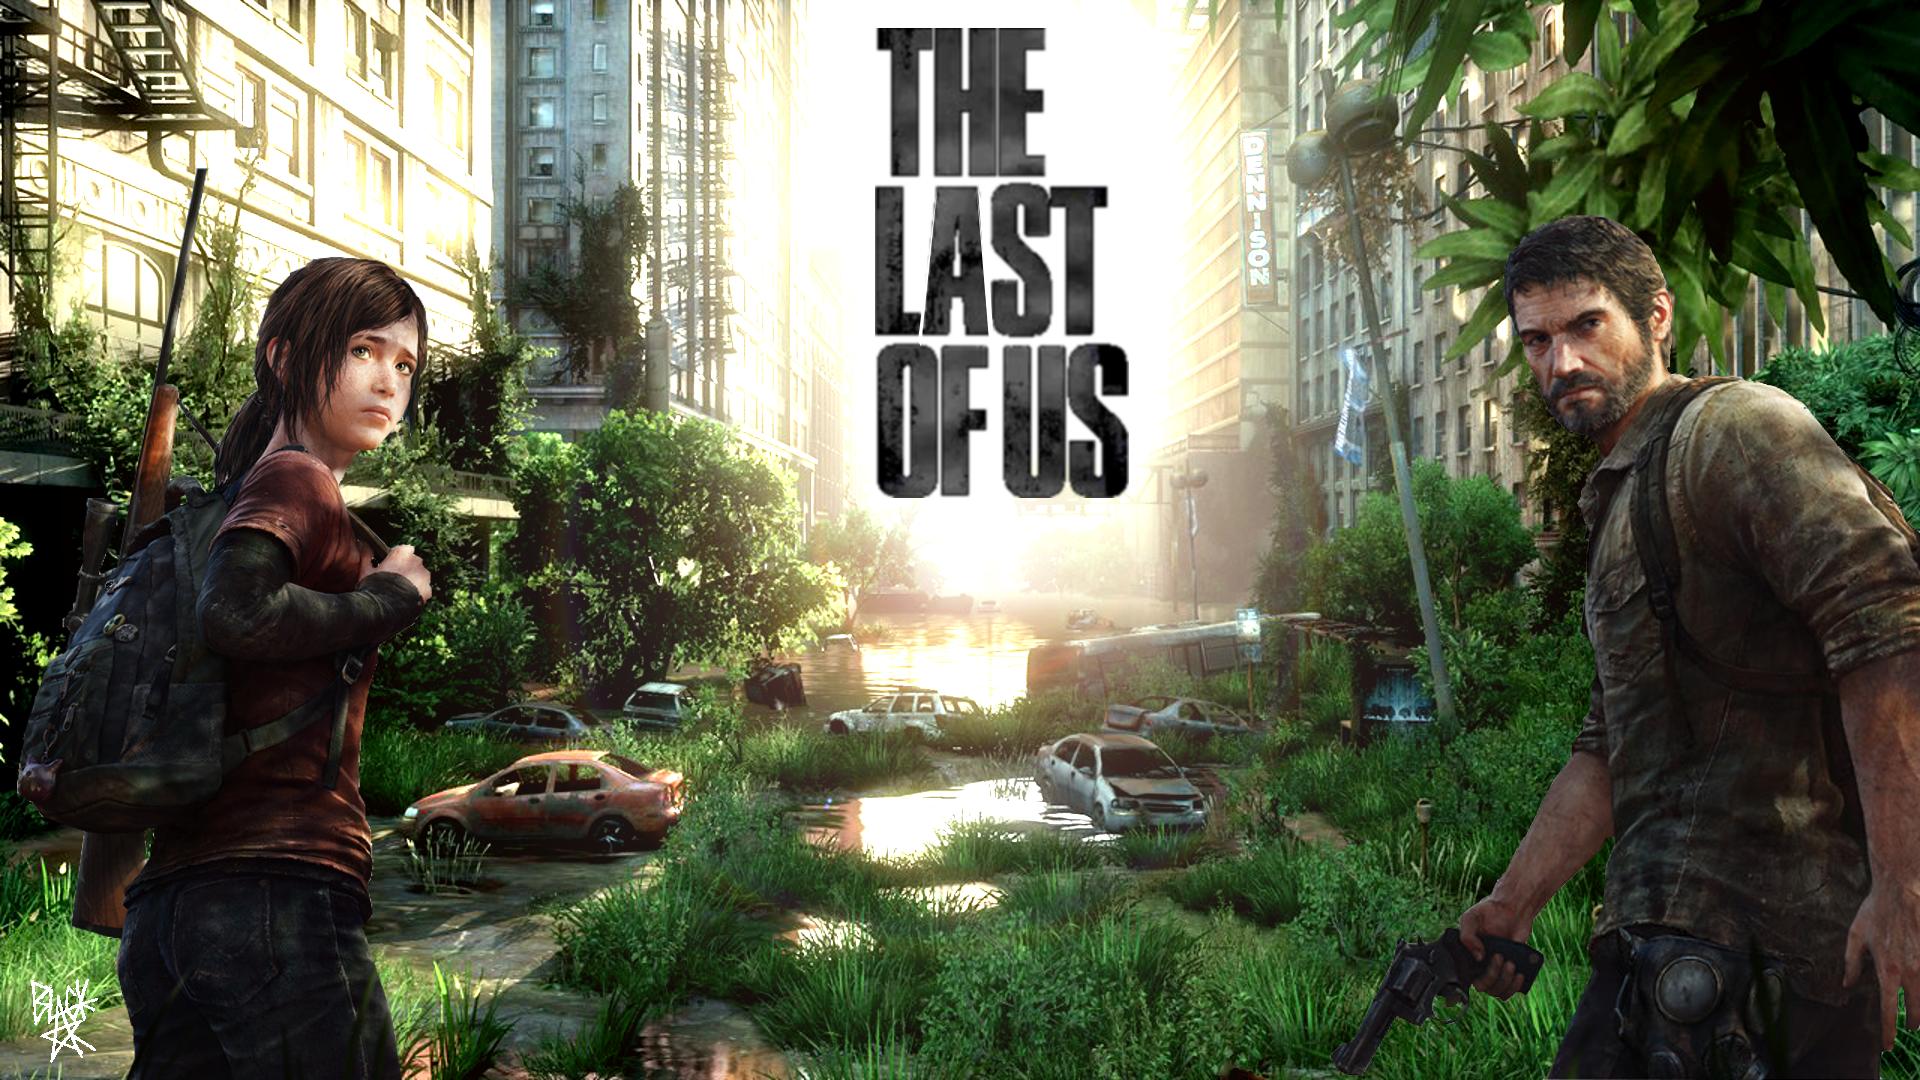 The Last Of Us Computer Wallpapers Desktop Backgrounds 1920x1080 1920x1080